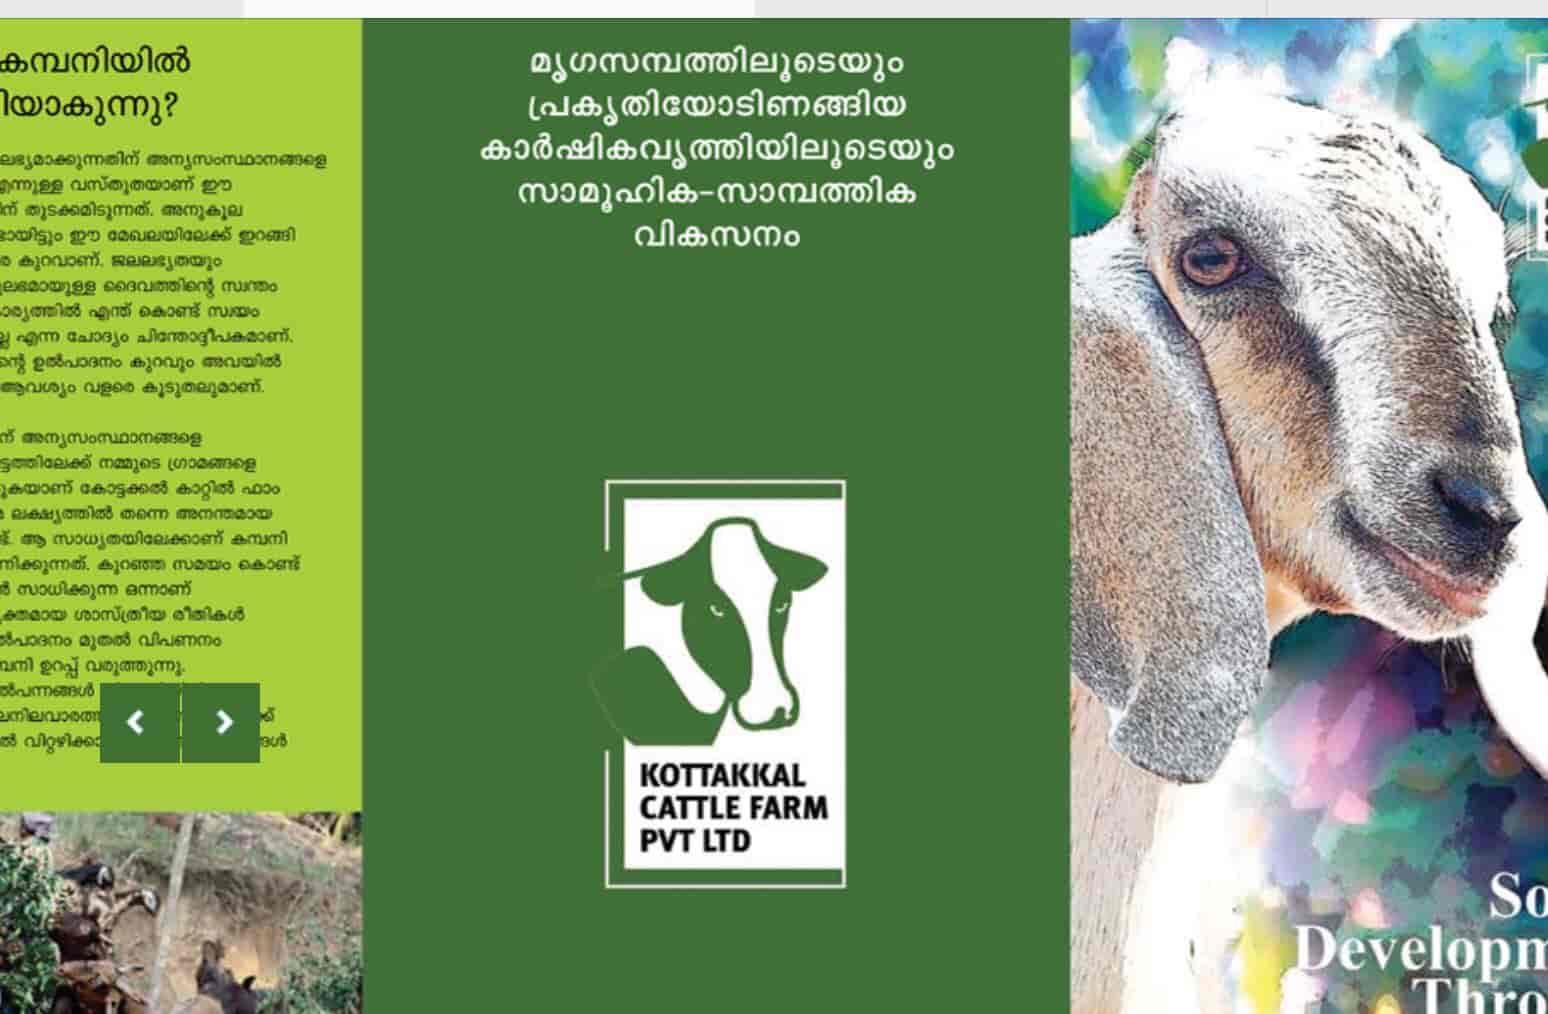 Kottakkal Cattle Farm Pvt Ltd, Kottakkal - Goat Farming in